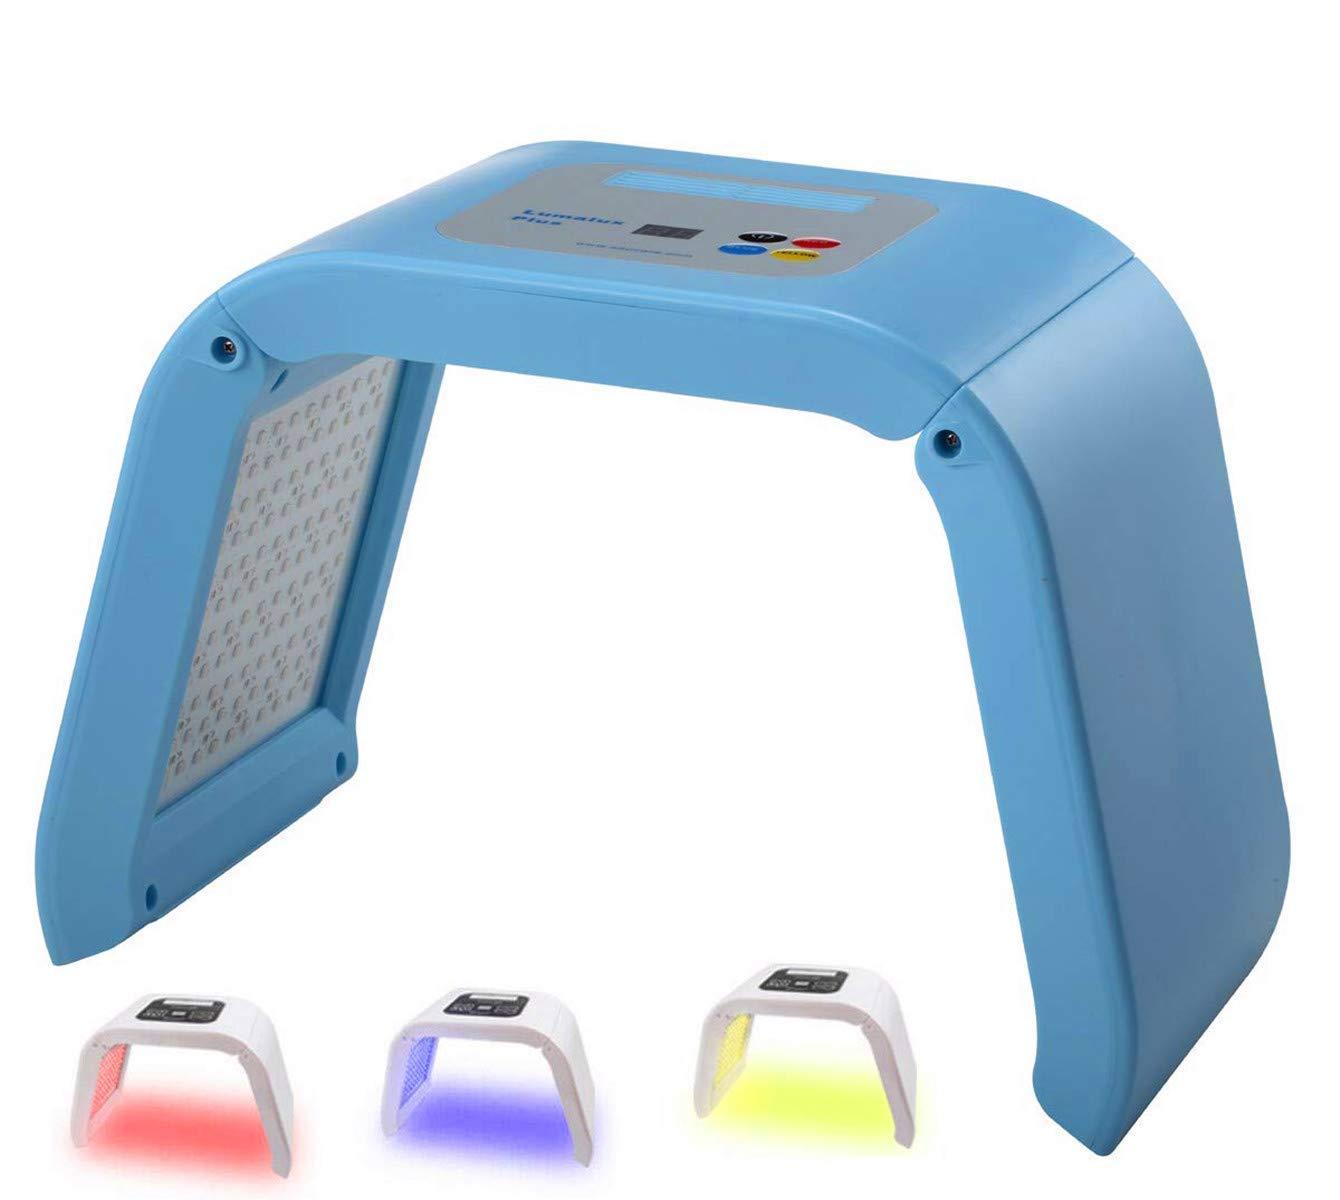 Vansaile Hot Sale 4 Colors Skin Care Machine- PDT 4 LED Light Photodynamic Skin Care Rejuvenation Photon Facial Body Therapy US Plug